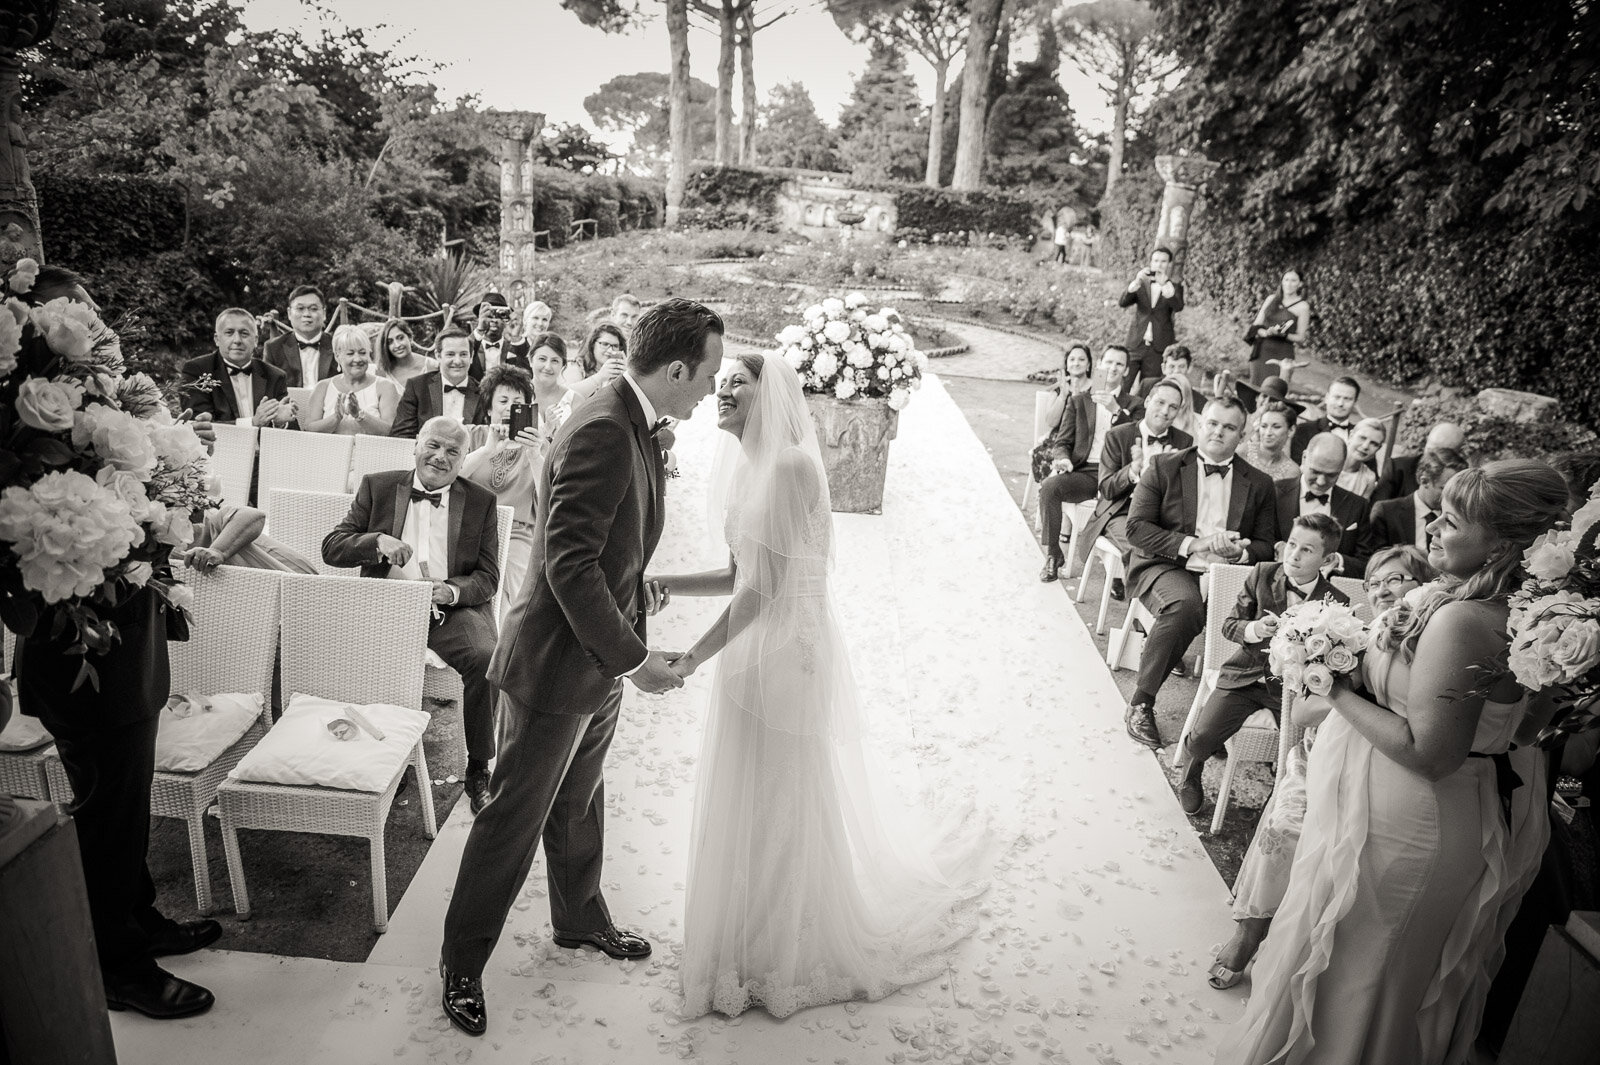 Russian Wedding in Villa Cimbrone Costiera Amalfitana 13.jpg